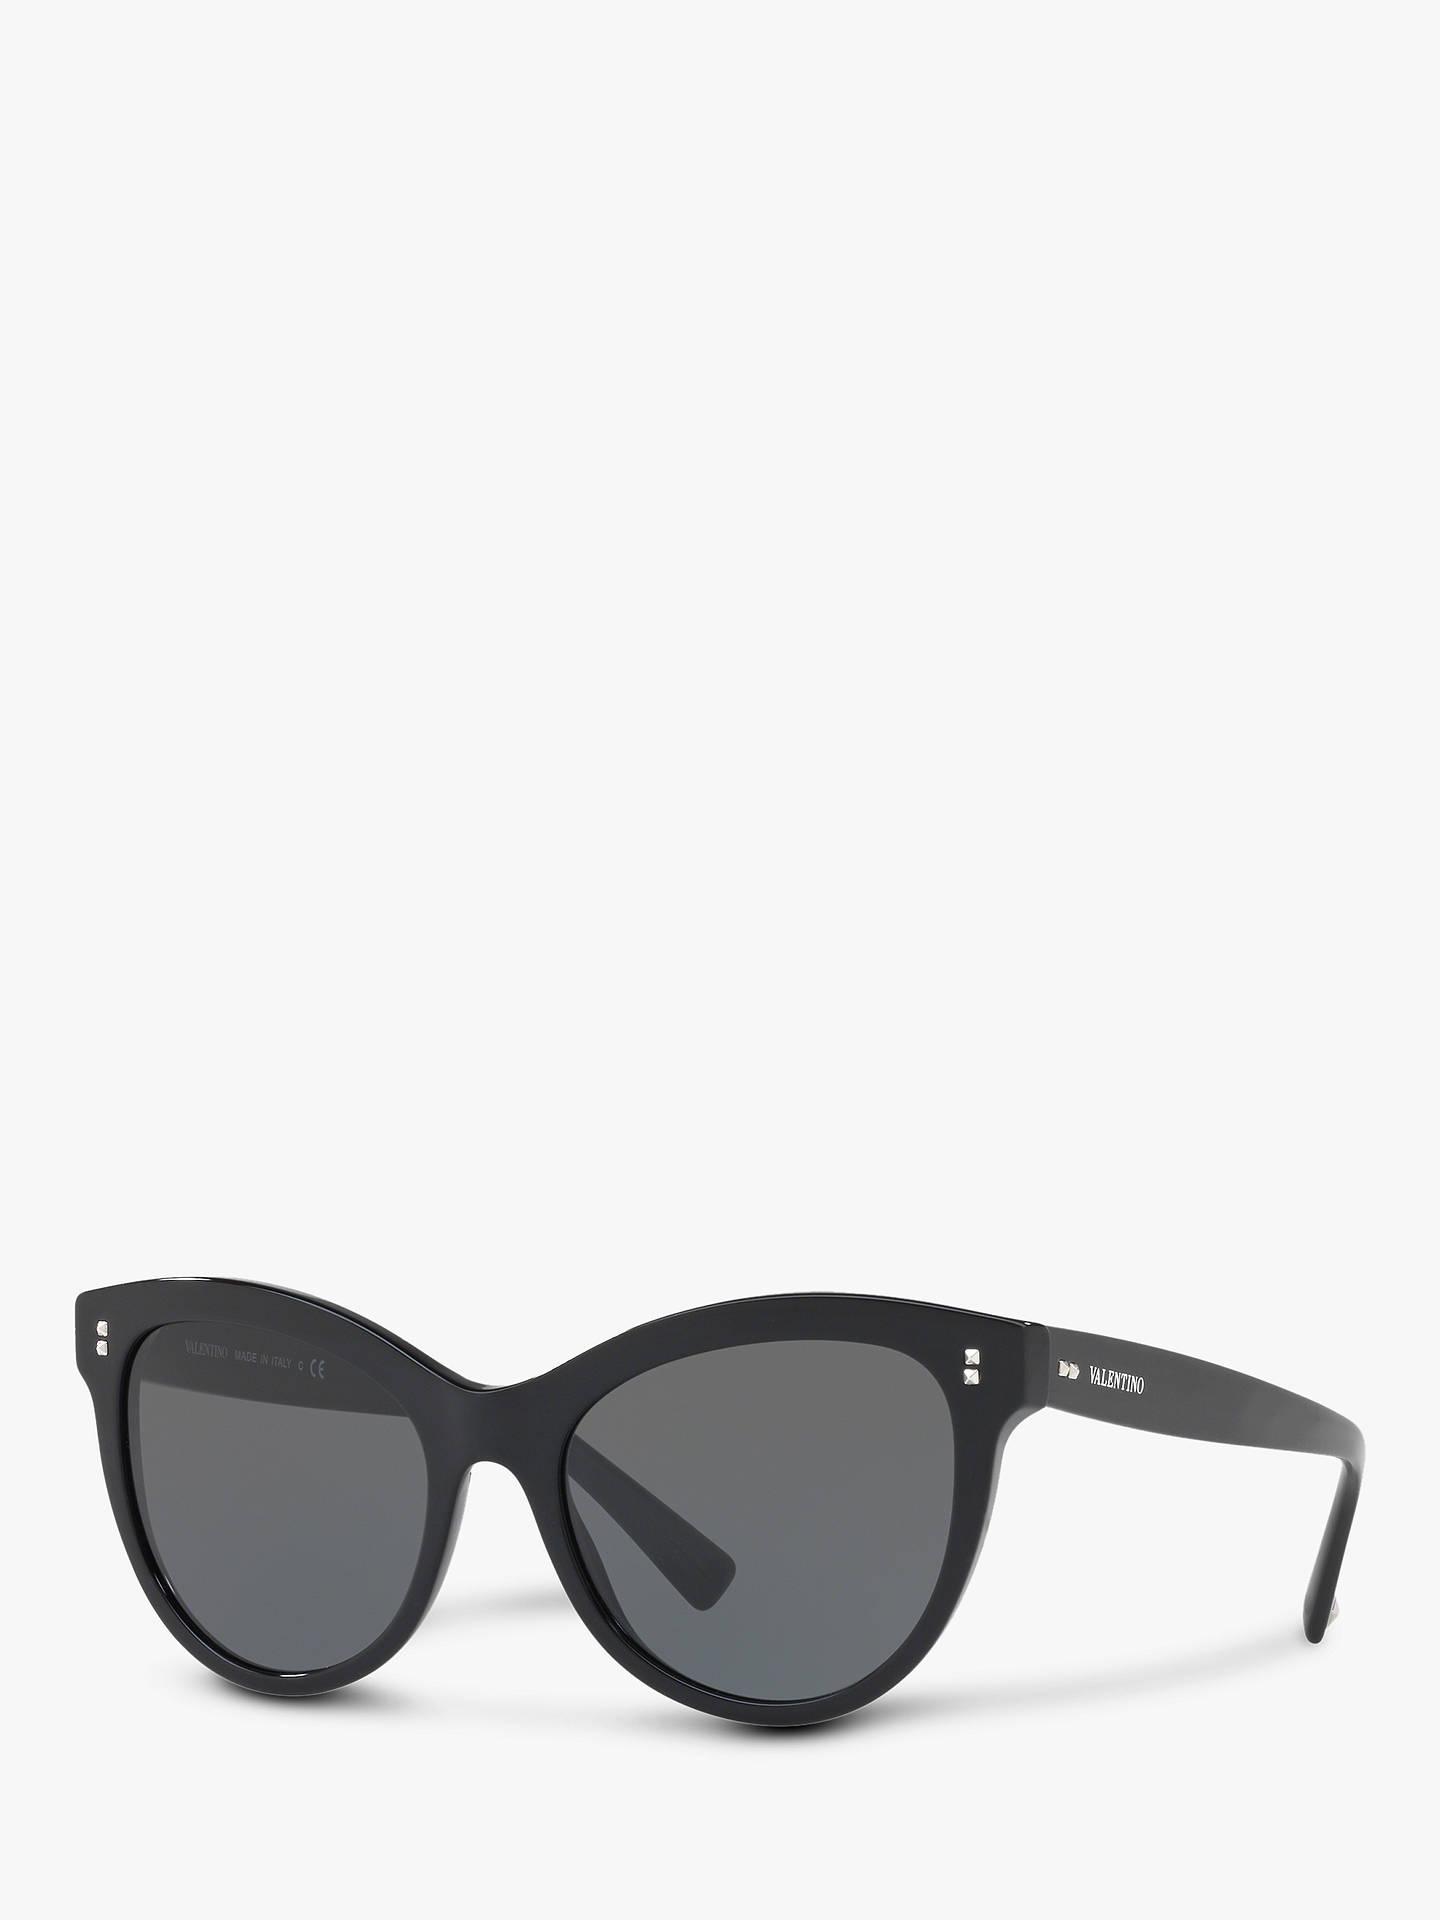 2e6f7dea0c2f3 Buy Valentino VA4013 Women's Cat's Eye Sunglasses, Black/Grey Online at  johnlewis. ...